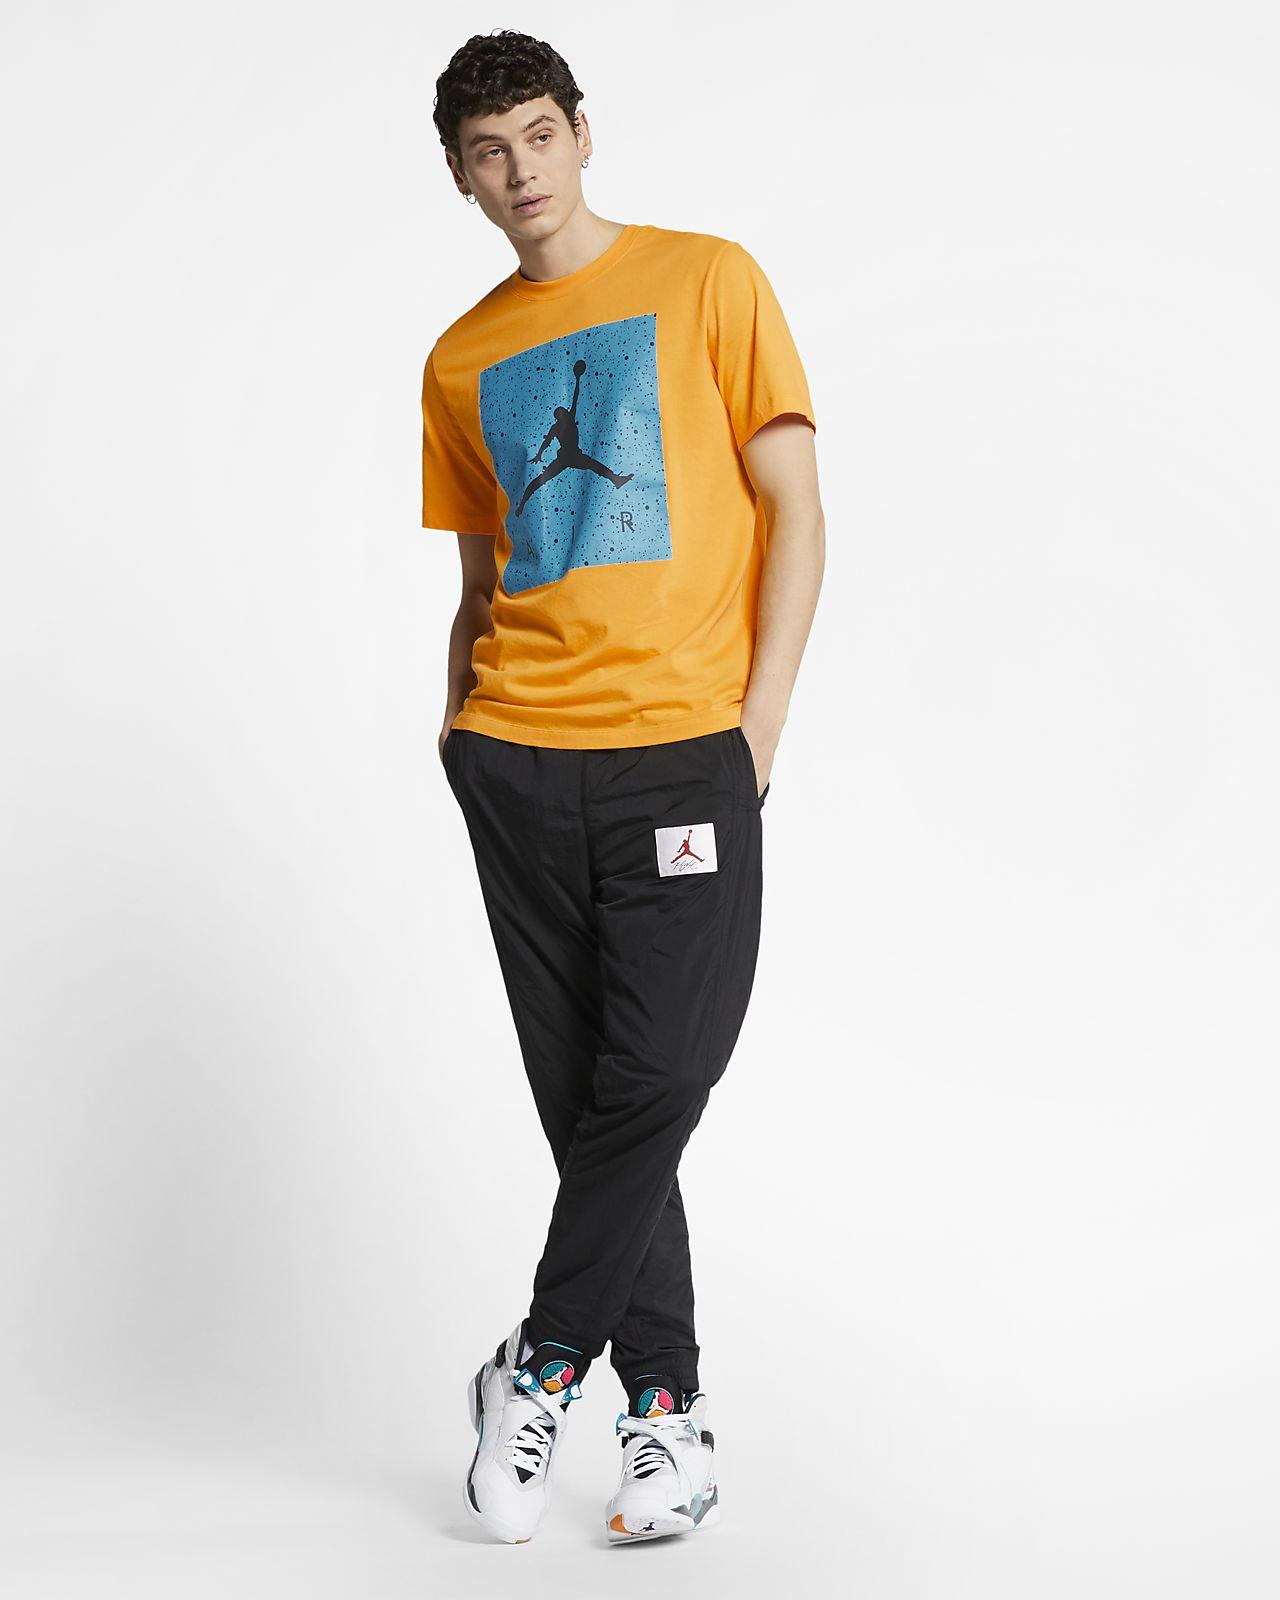 new style fbb76 48991 ... Tee-shirt Jordan Poolside pour Homme